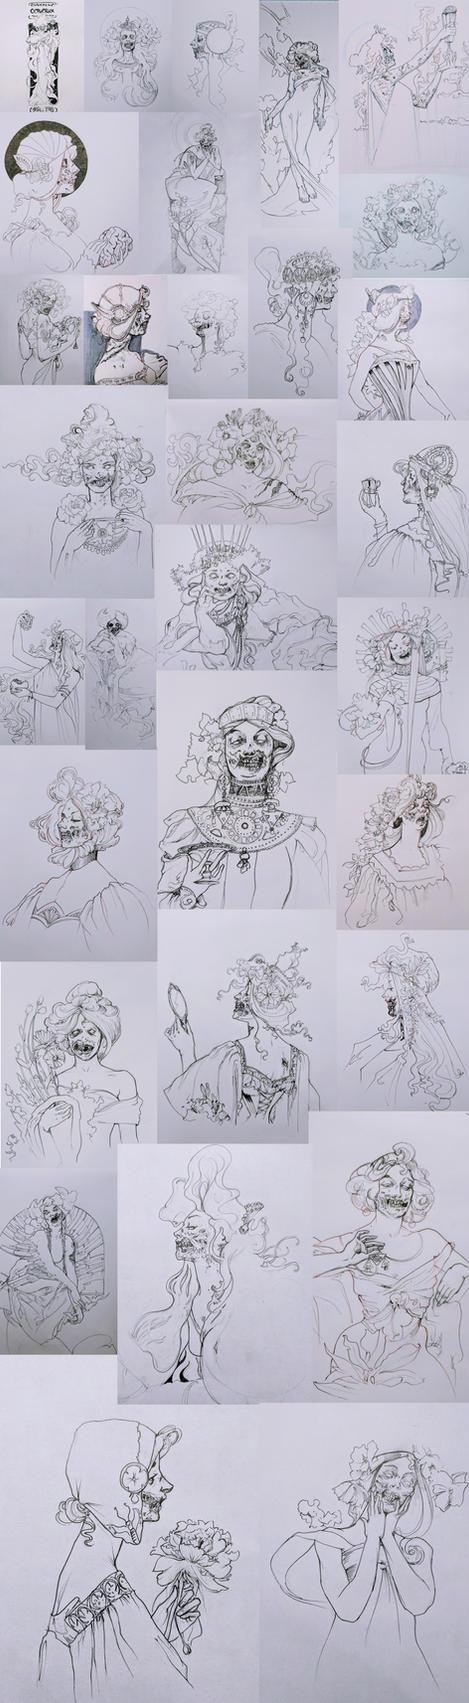 Inktober 2017 - Zombie Nouveau by Erebus88